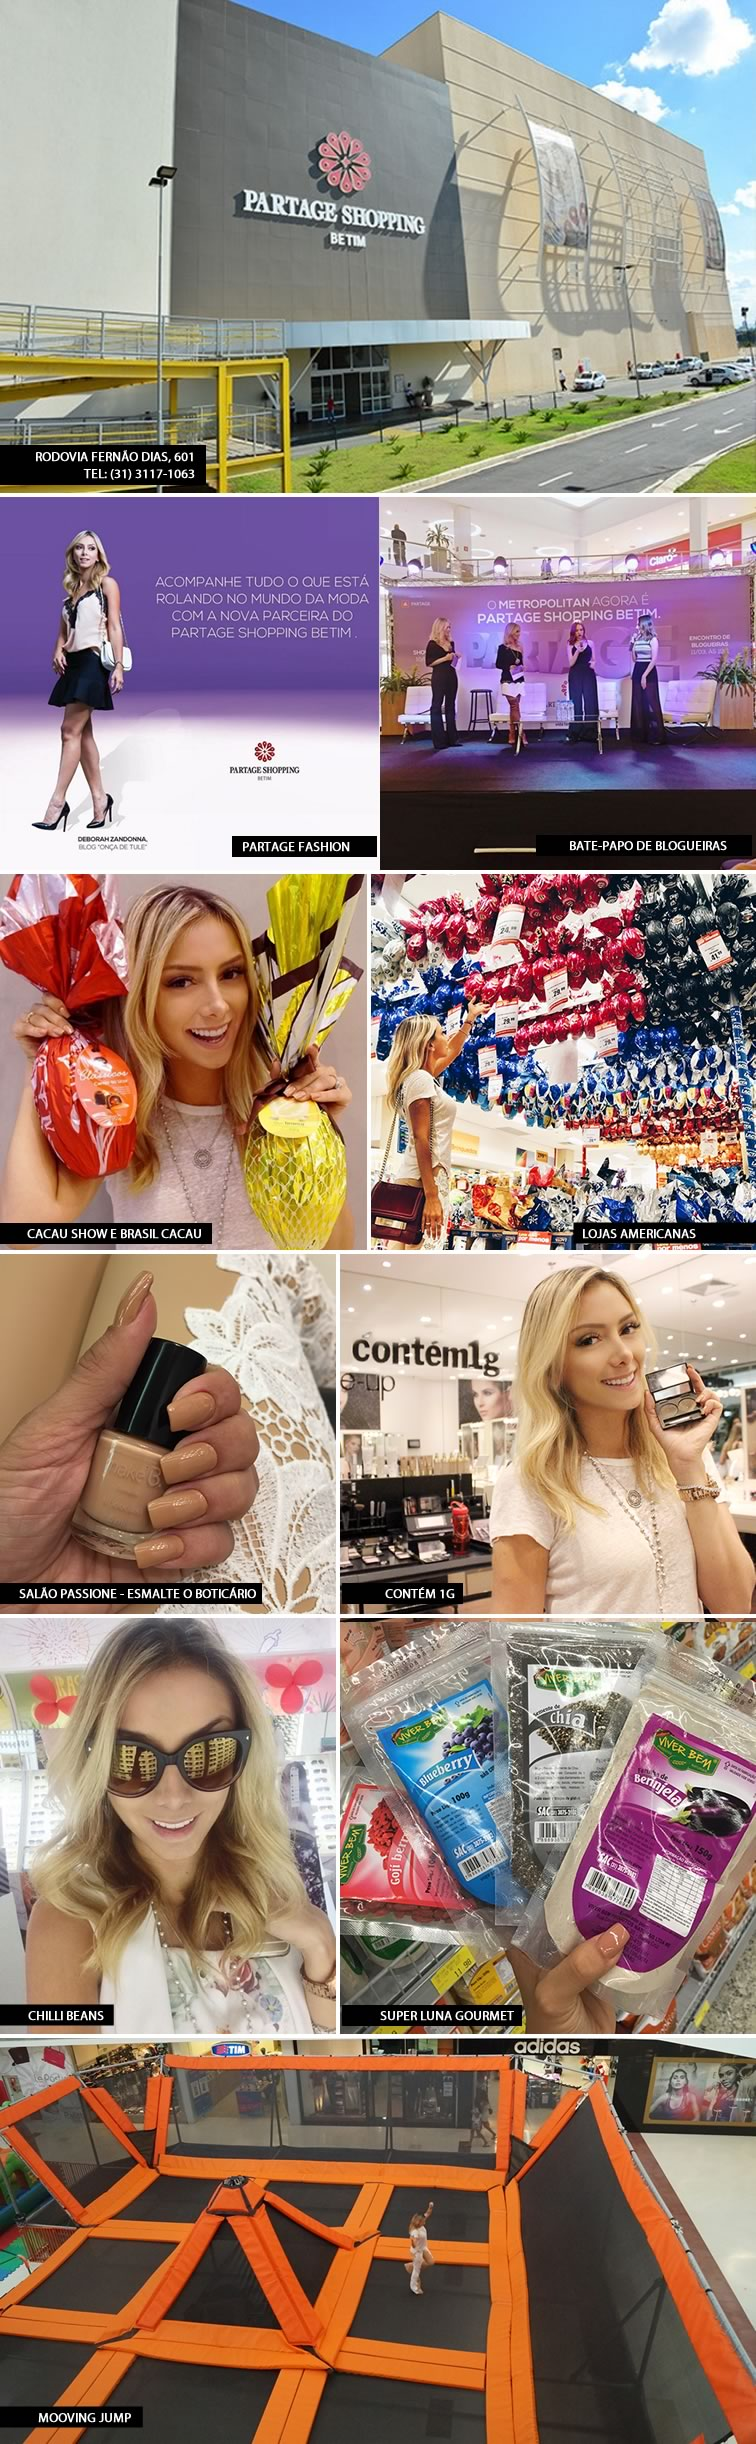 shopping-partage-betim-embaixadora-deborah-zandonna-partage-fashion